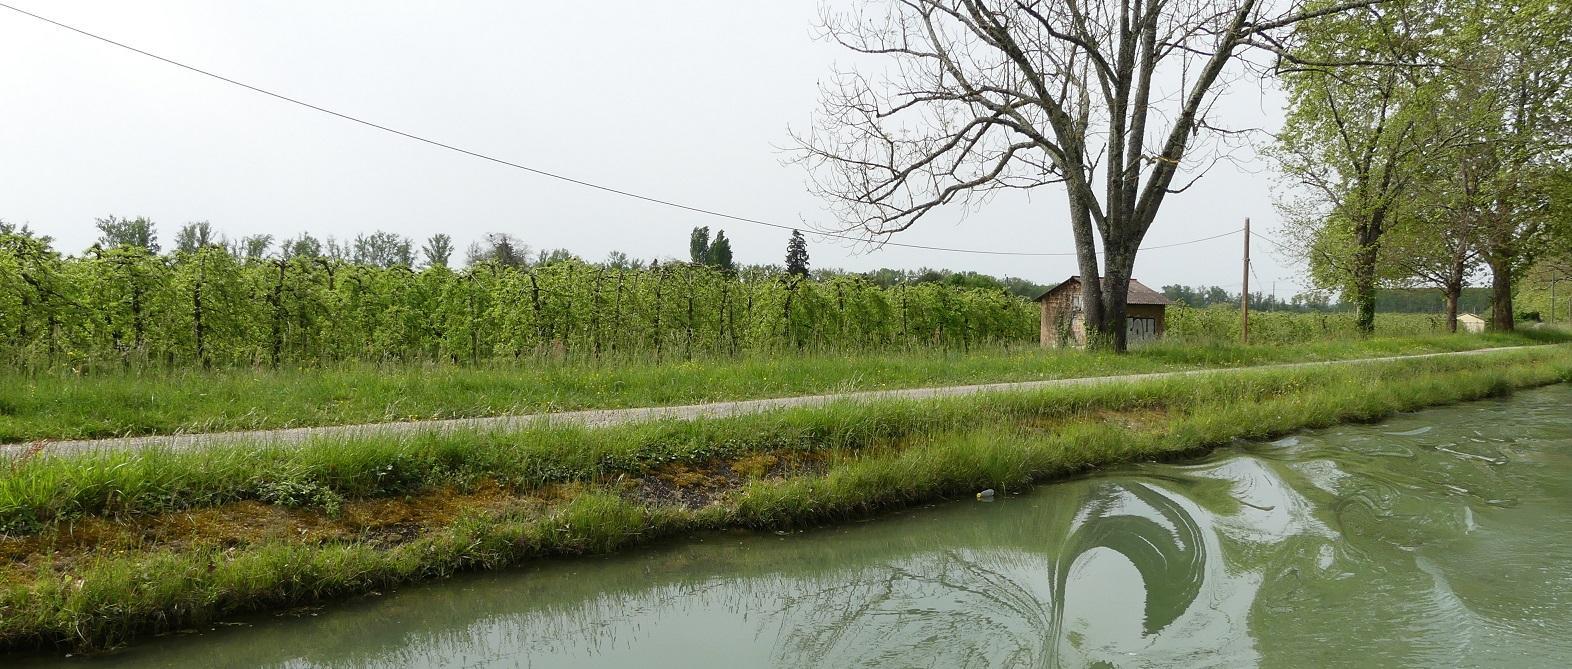 22 Avril Valence d'Agen - Moissac